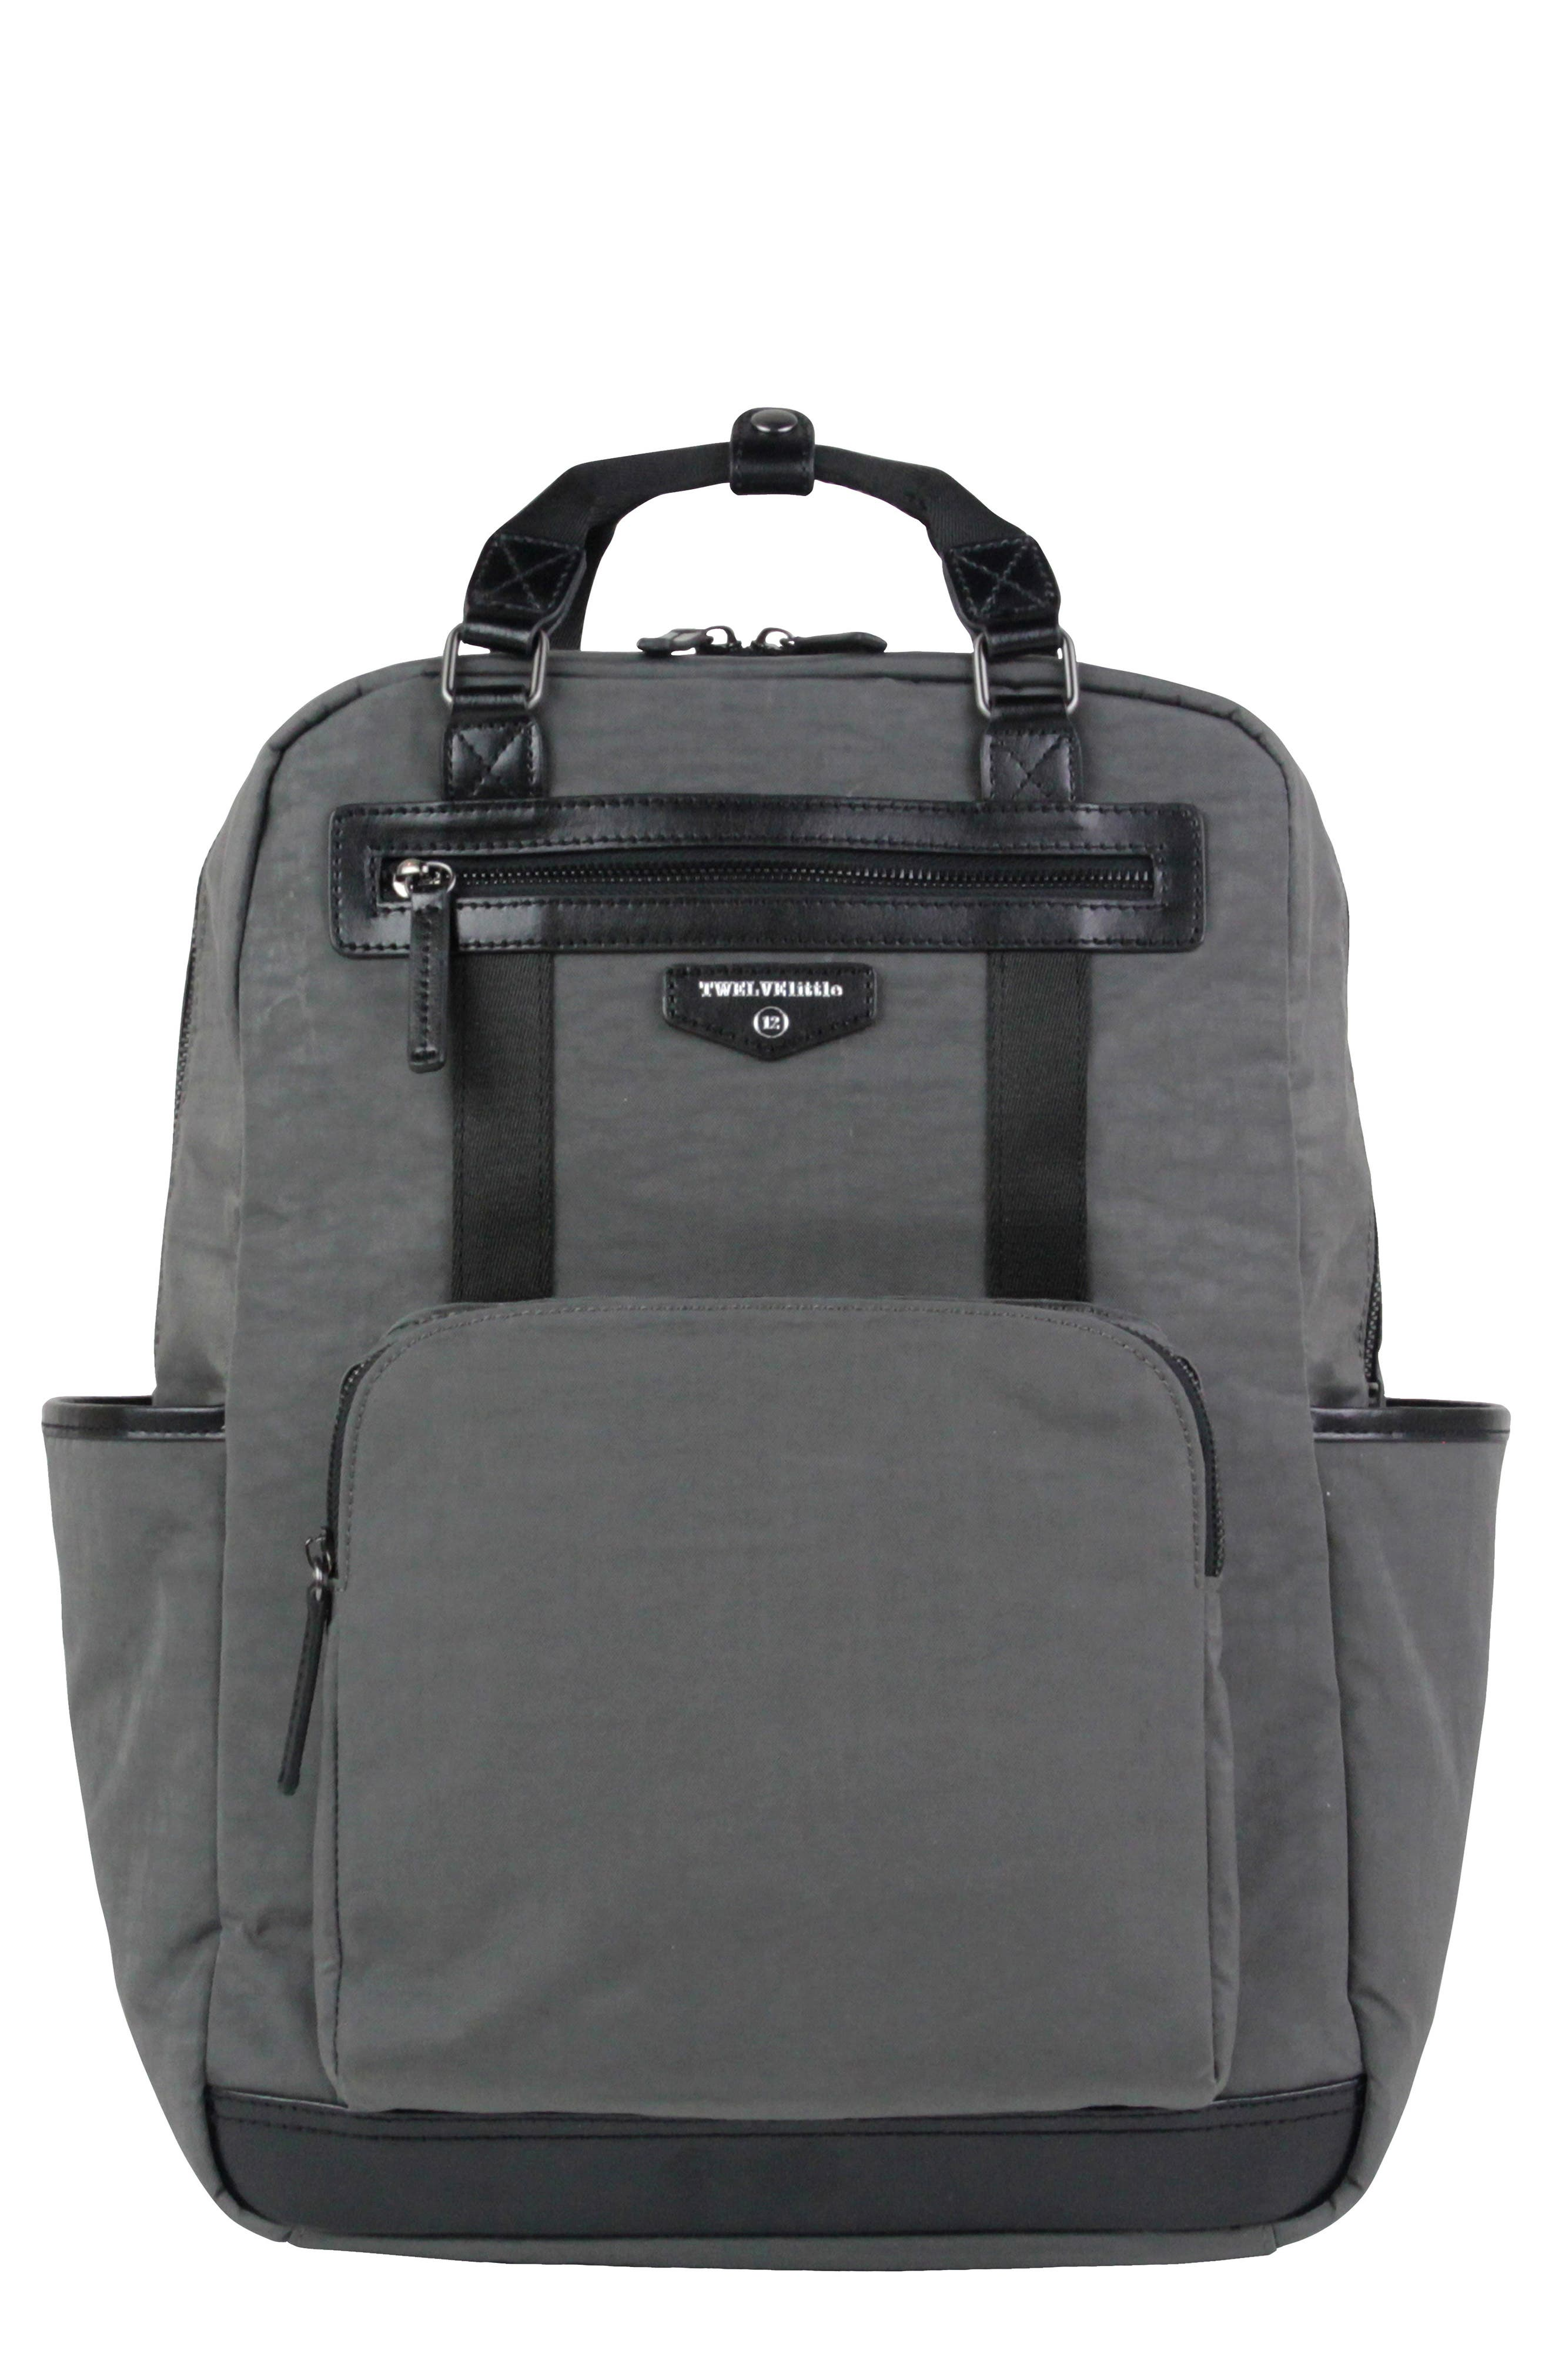 TWELVELITTLE, 'Courage' Unisex Backpack Diaper Bag, Main thumbnail 1, color, DARK GREY